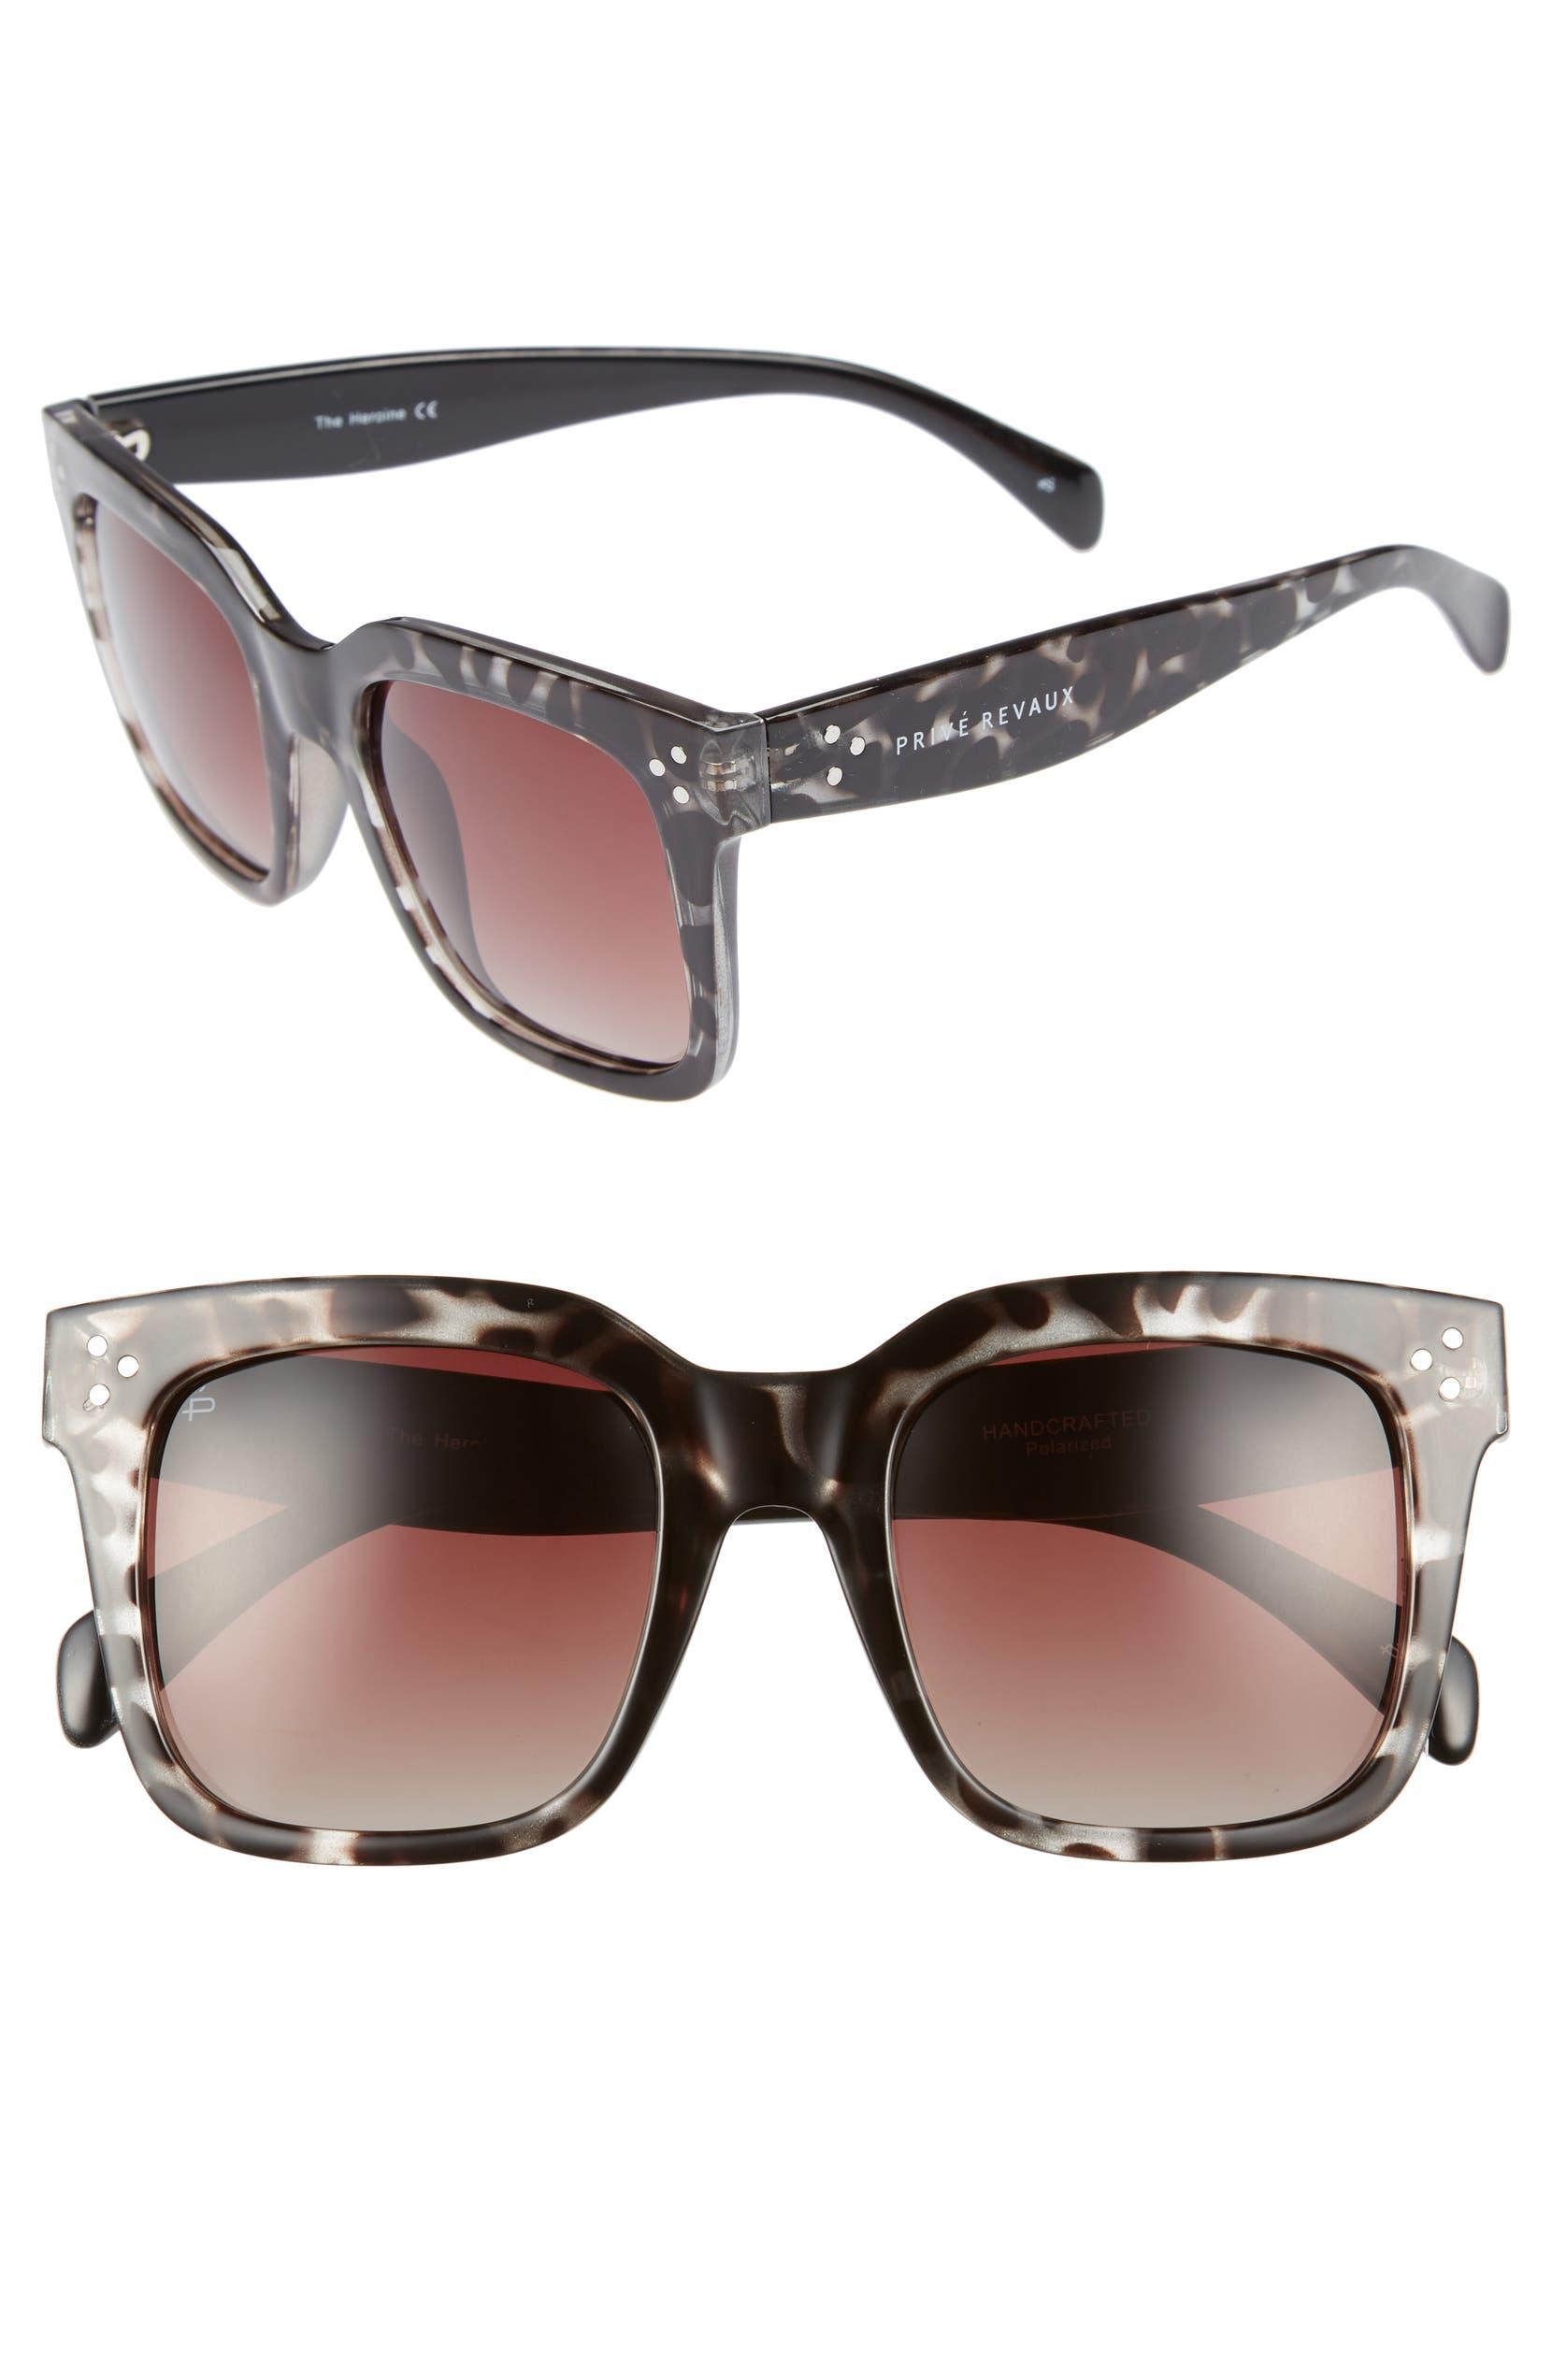 ed7ddac0611 Privé Revaux The Heroine 53mm Sunglasses